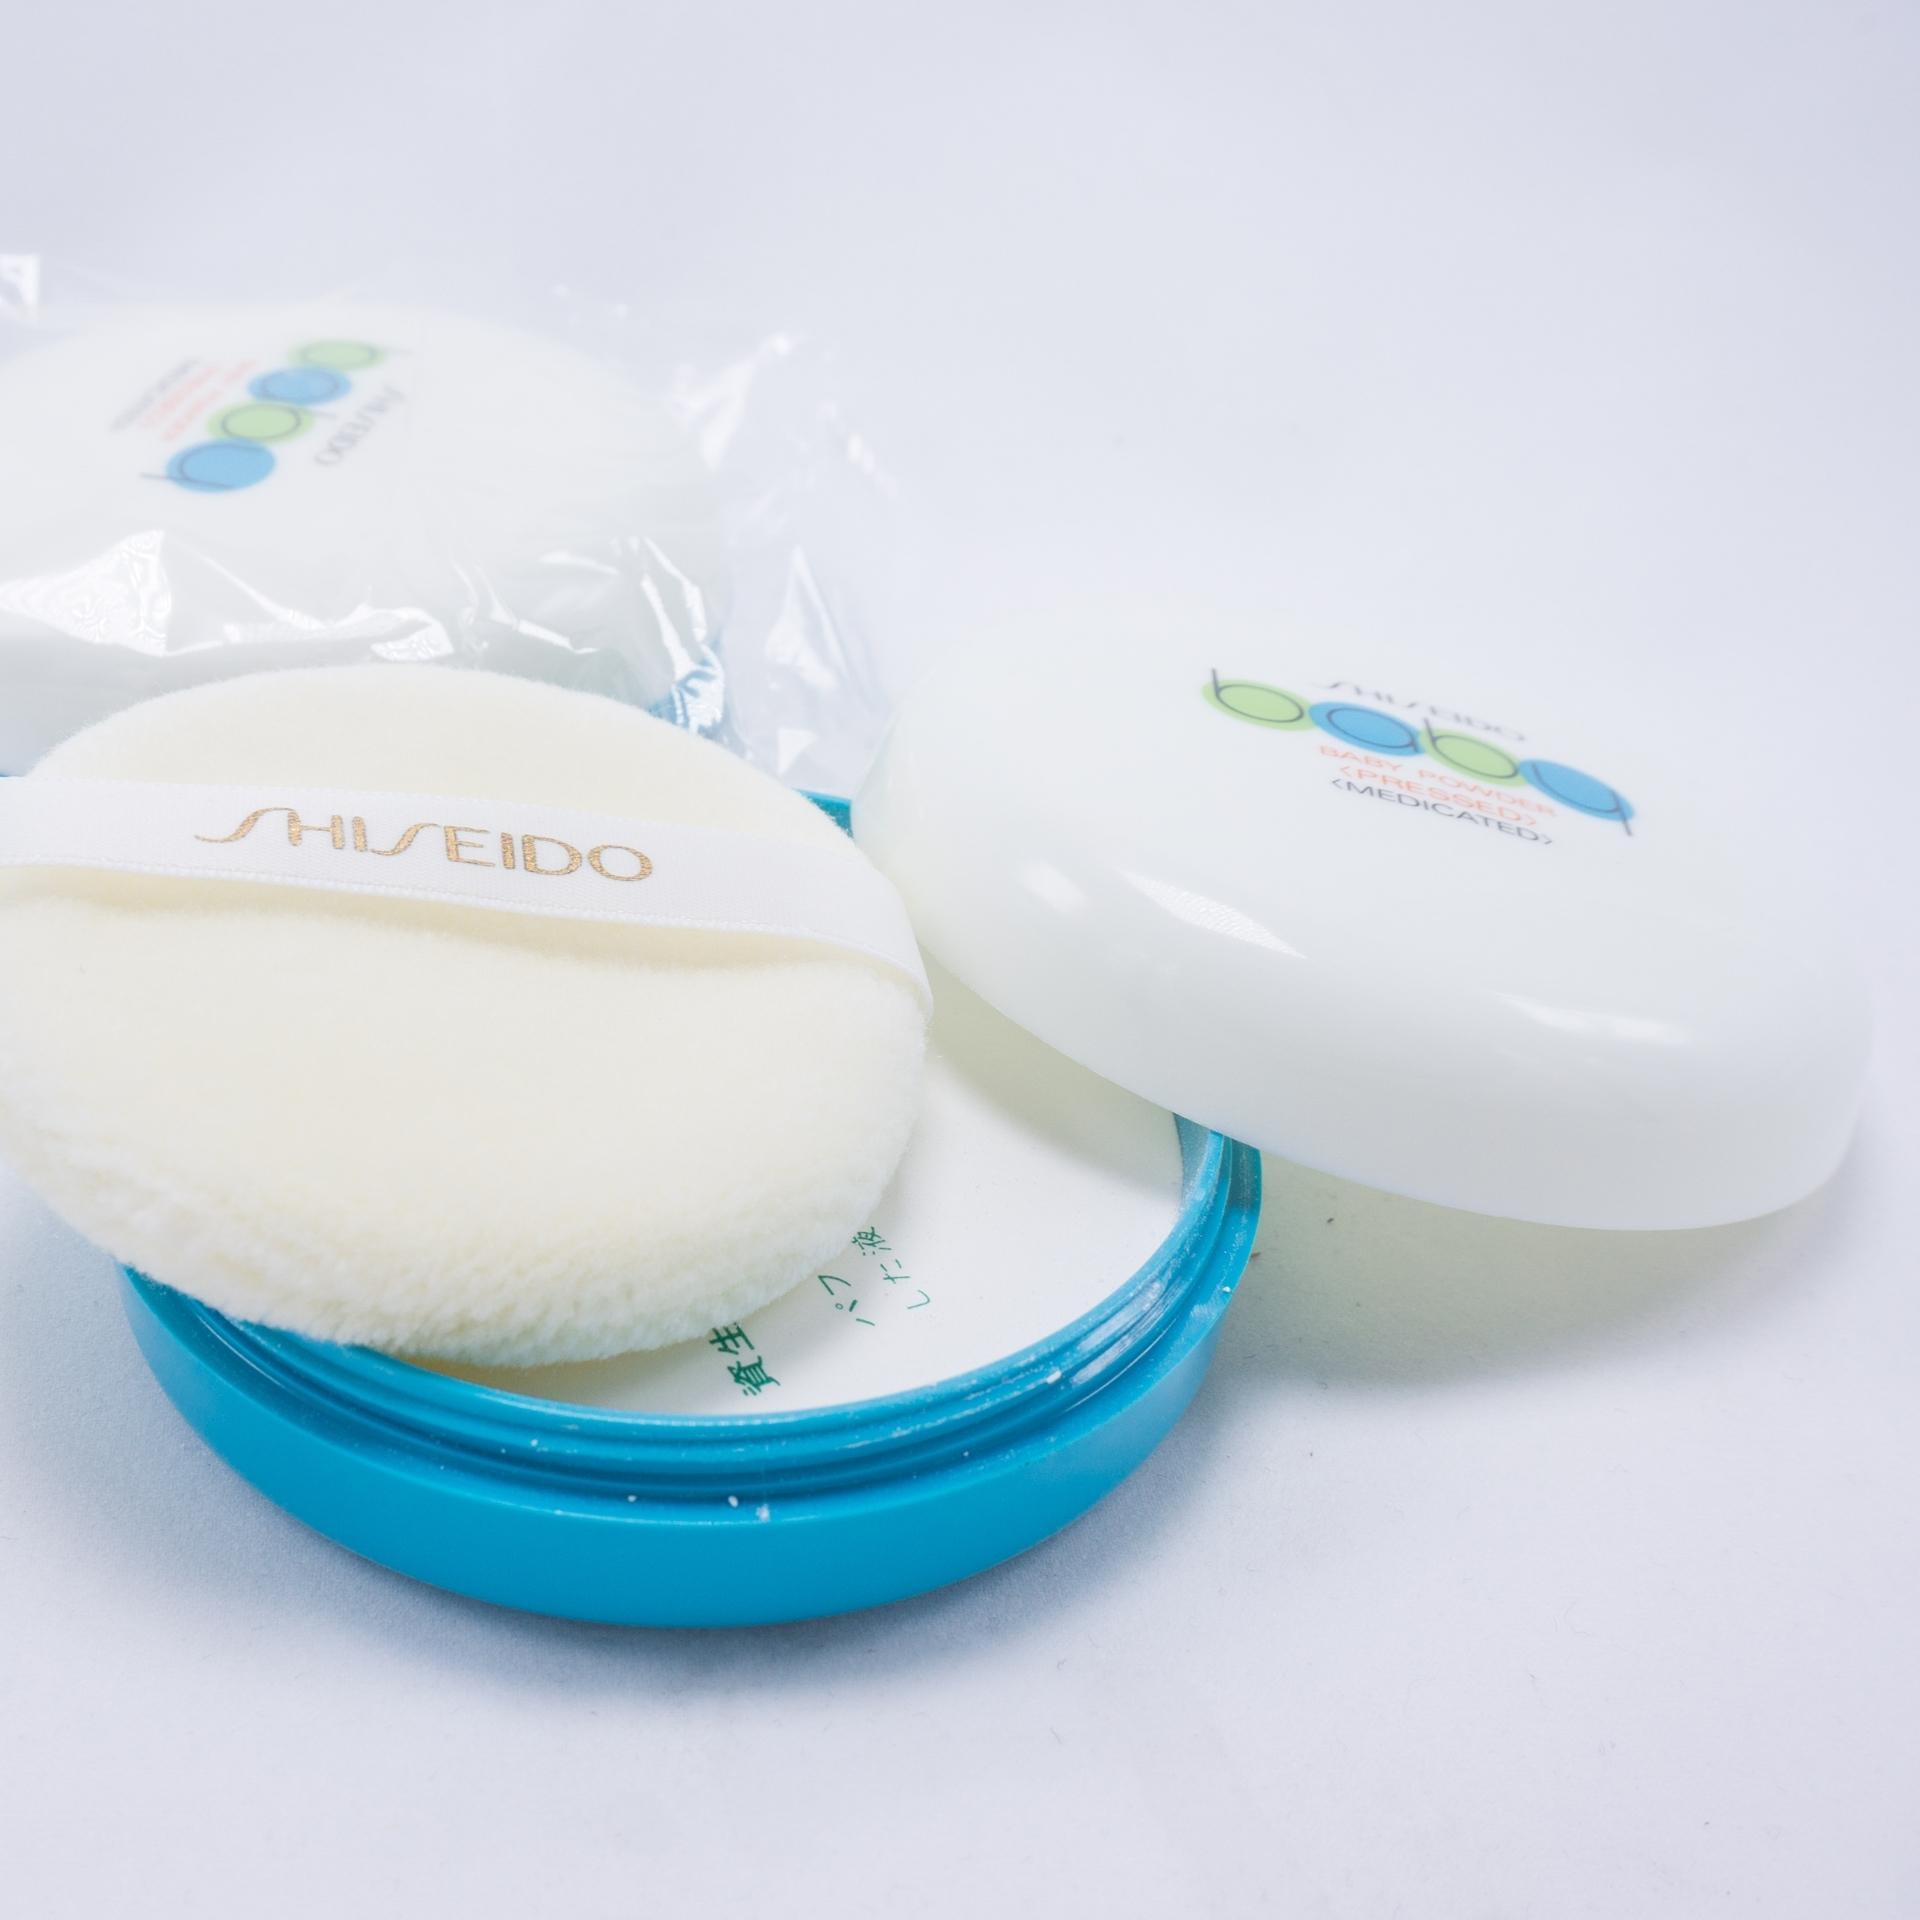 kem-bb-cream-cc-cream-phan-rom-shiseido-baby-powder-pressed-nhat-ban-1009